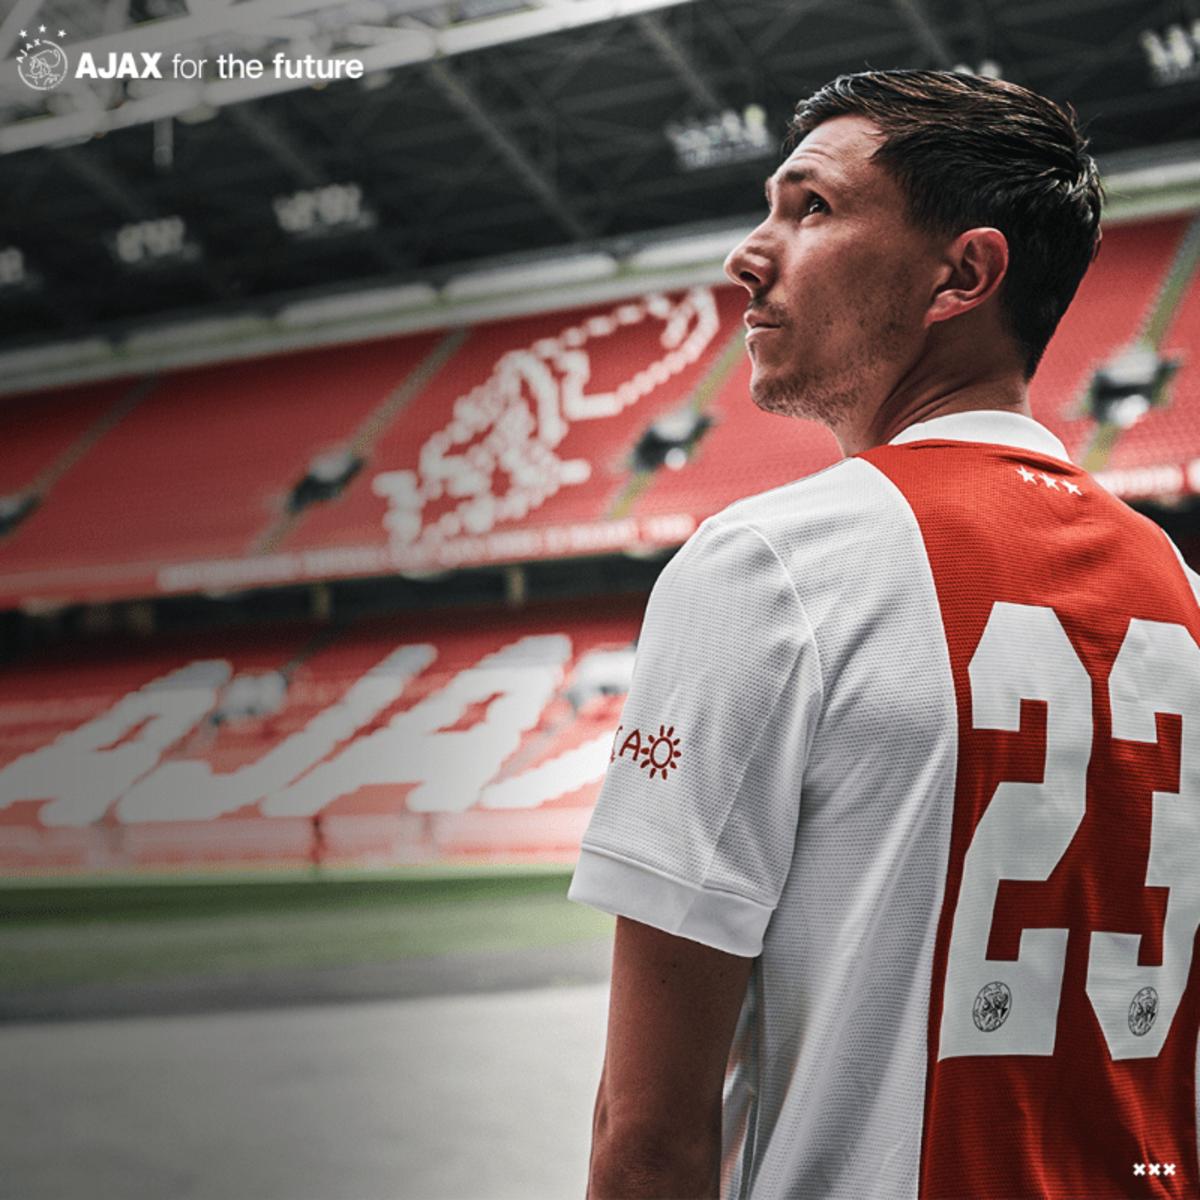 Steven Berghuis has signed for Ajax, Feyenoord's bitter long-standing rivals